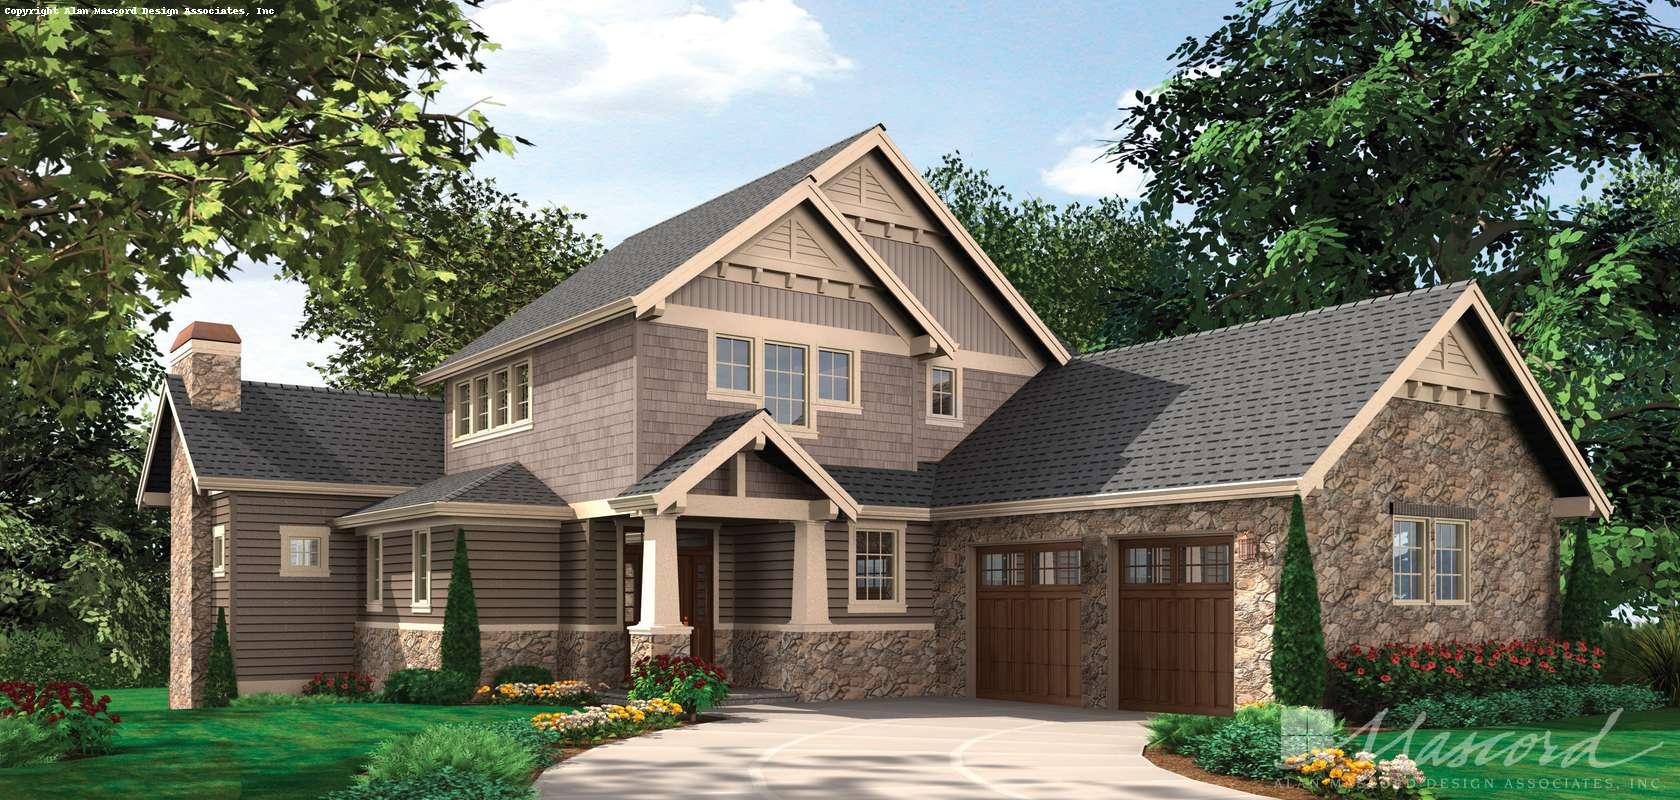 Mascord House Plan 2387: The Iverson